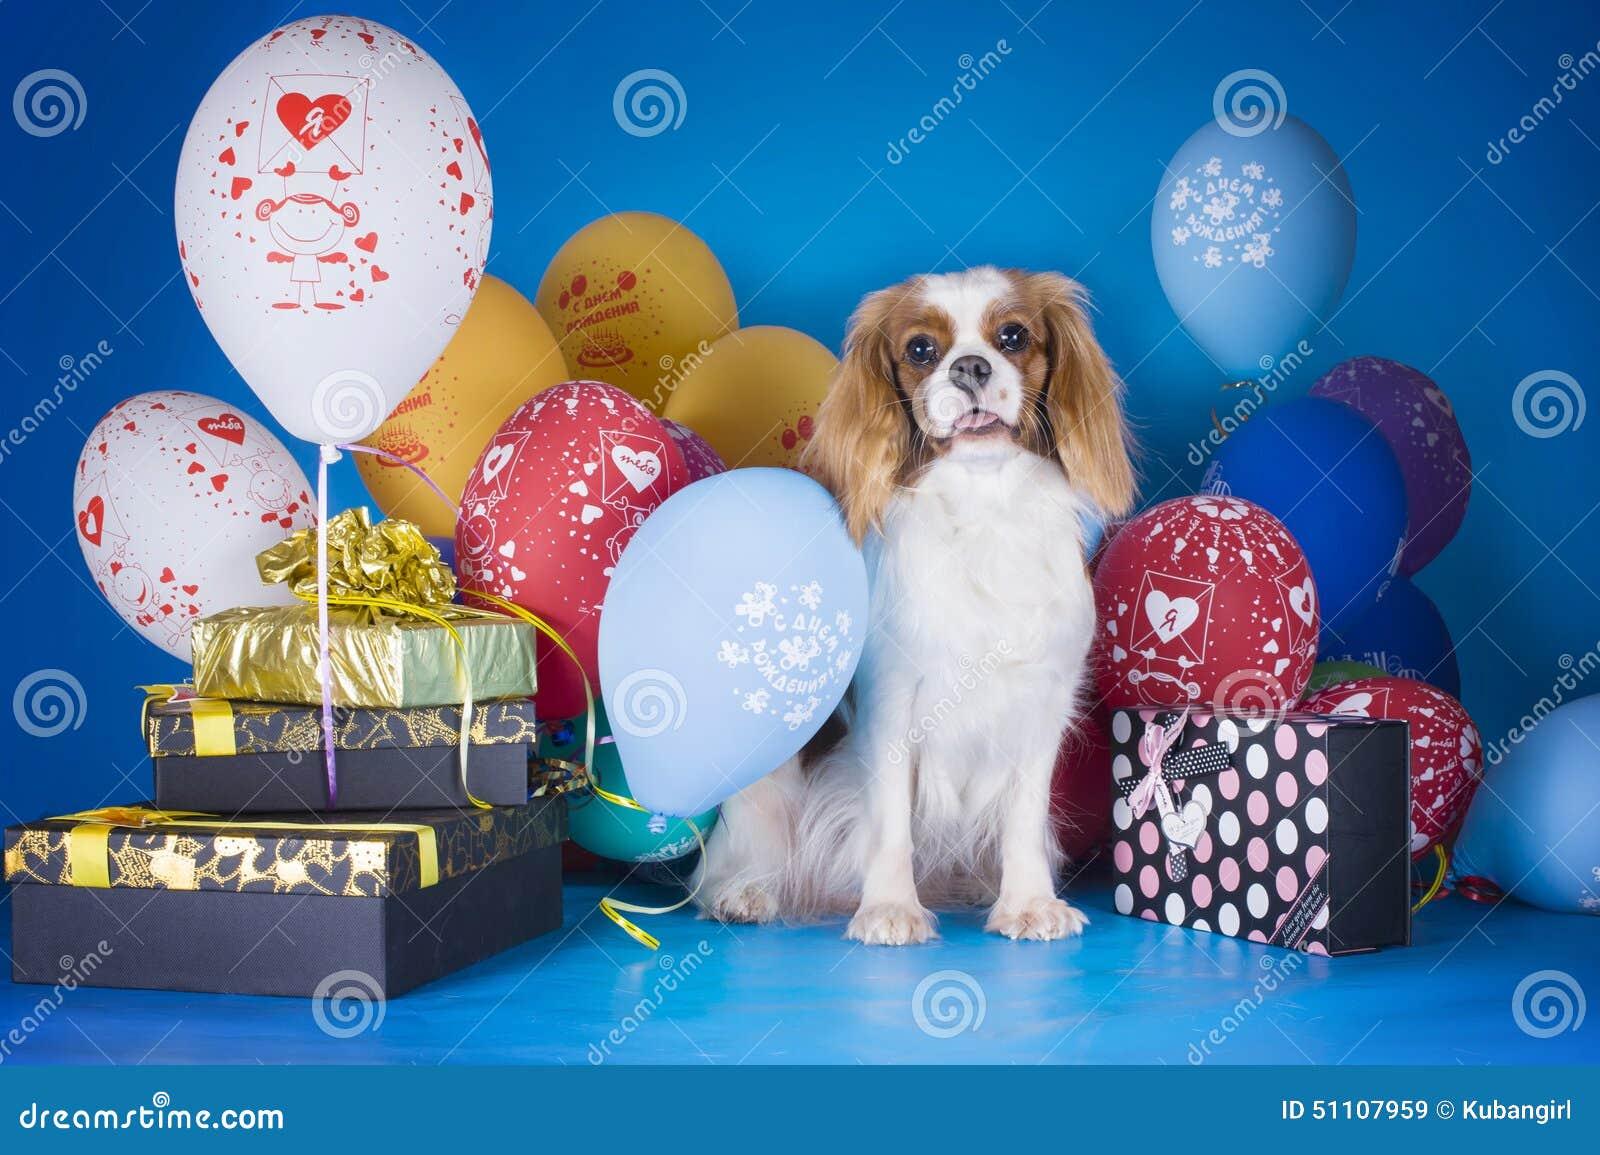 Puppy Arrogante Koning Charles Spaniel met ballons en giften op B